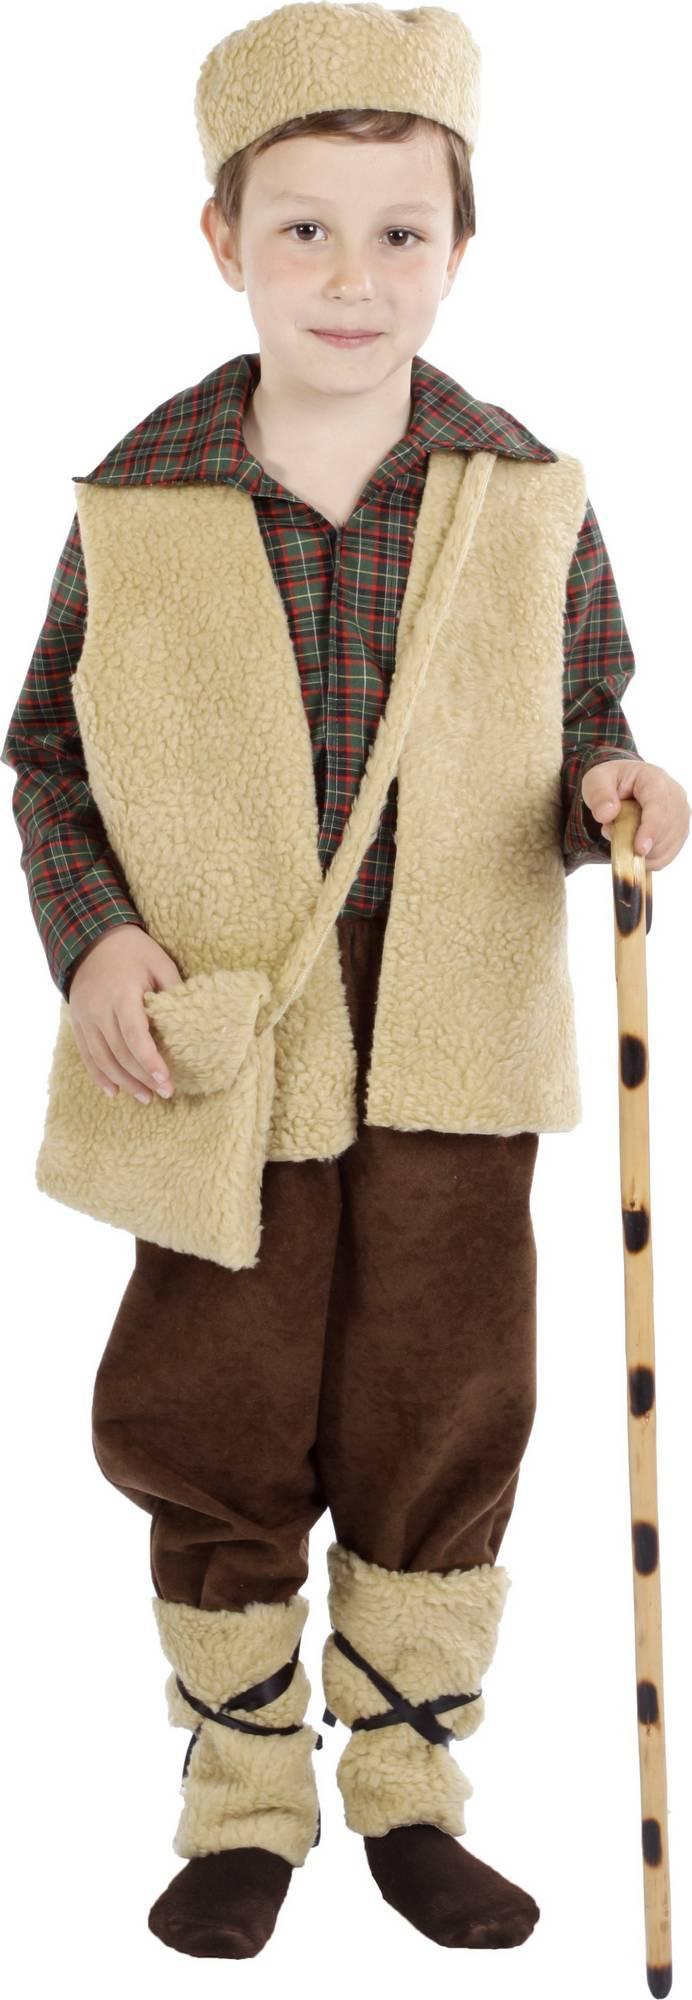 7d7b27a7a7e0f Costume pastorello bambino